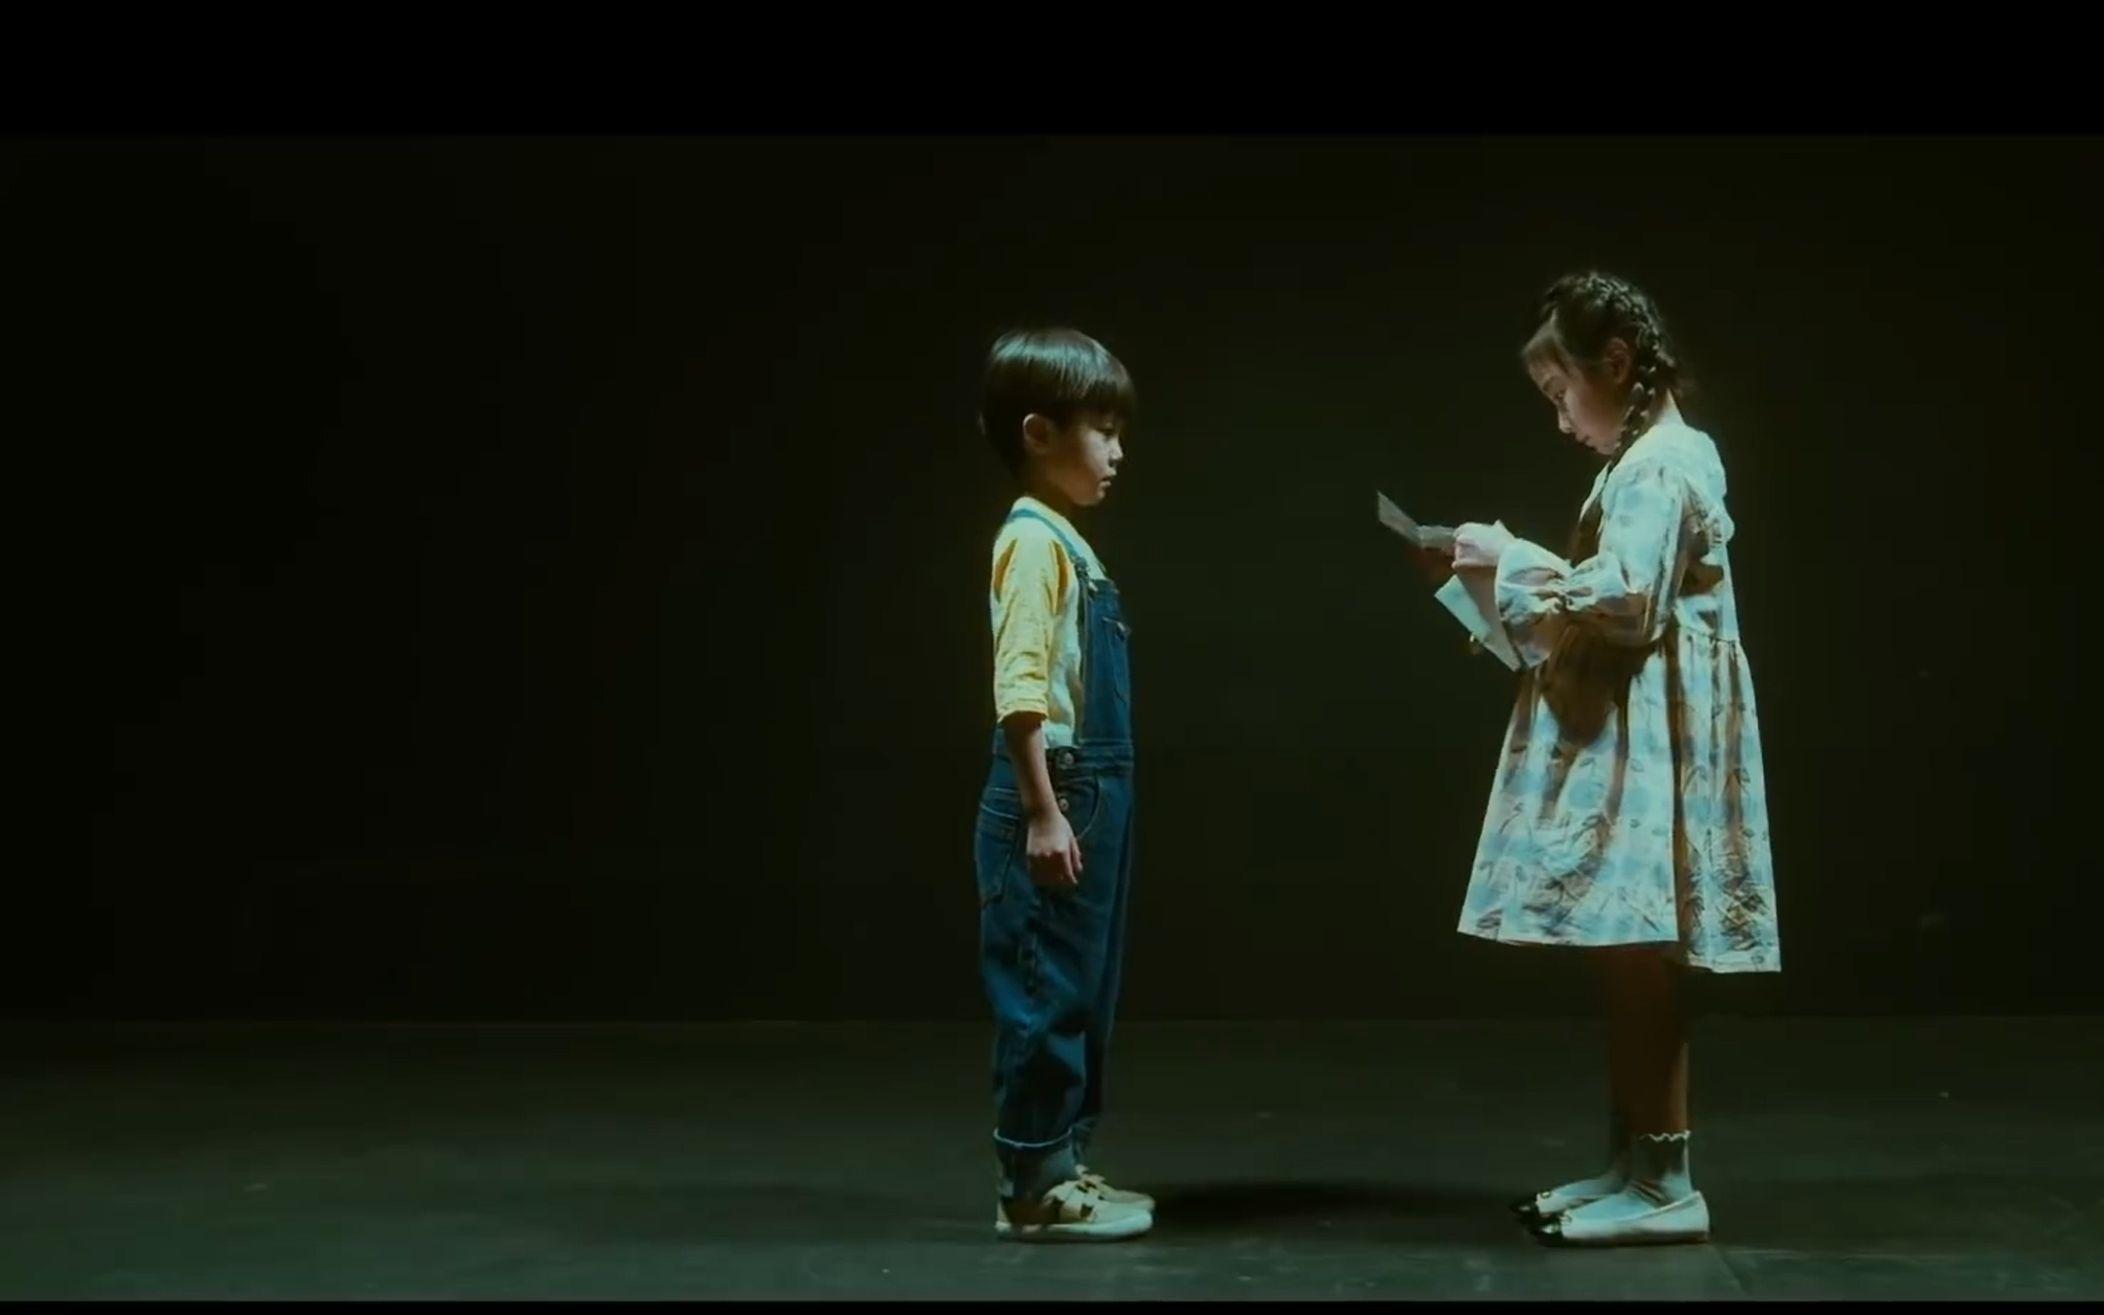 VINXEN餅仔寫給女友的小甜歌-STAR(星) 中字MV_嗶哩嗶哩 (゜-゜)つロ 干杯~-bilibili